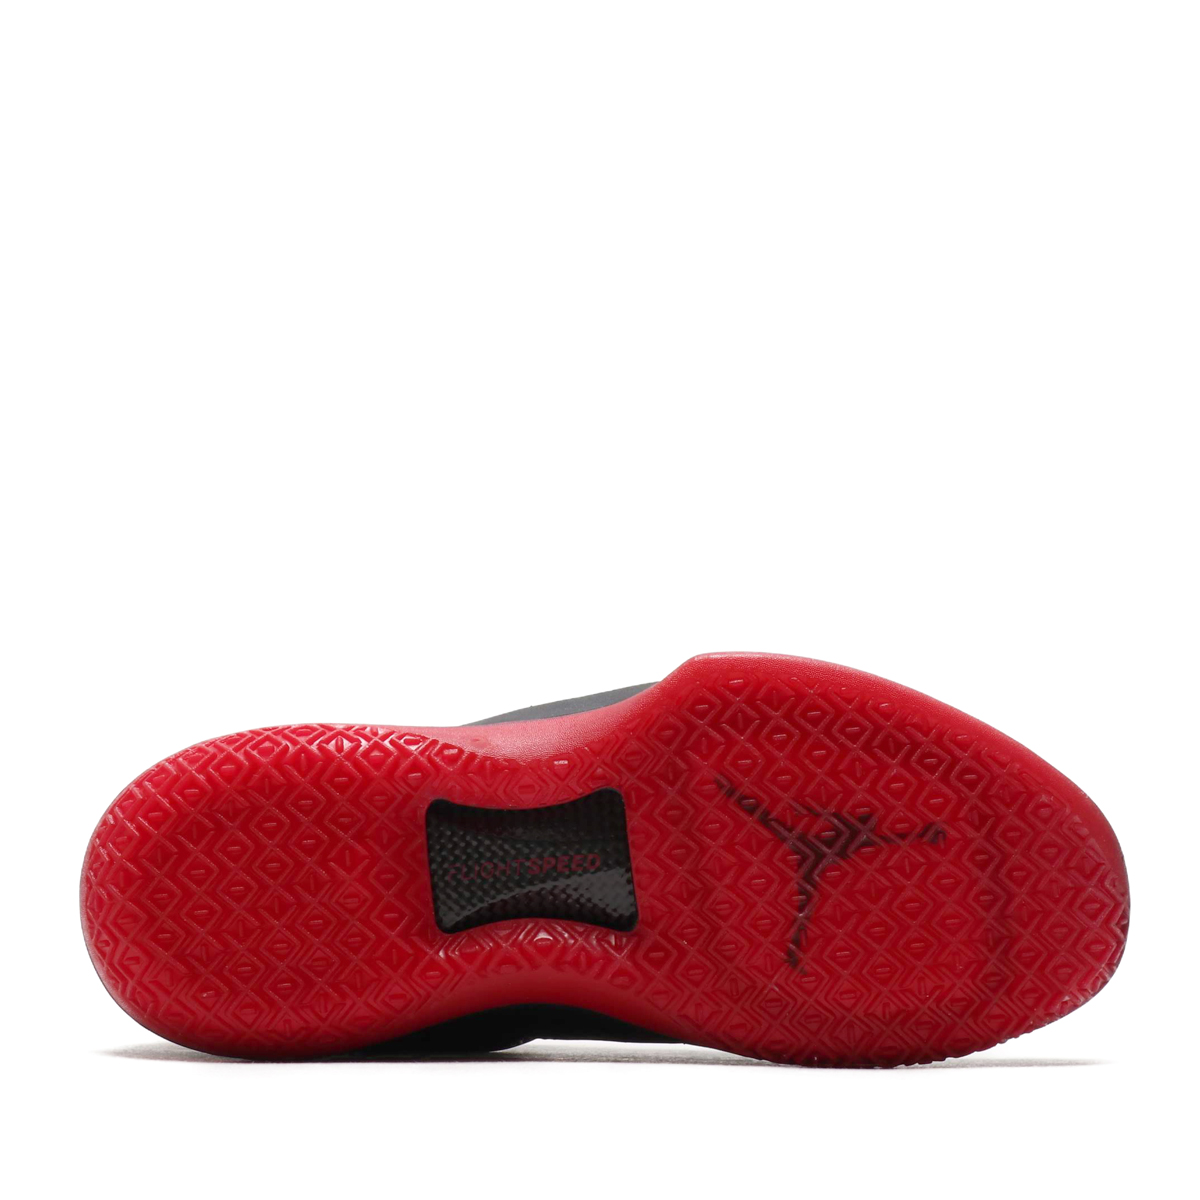 huge discount c7859 94c34 NIKE AIR JORDAN XXXII LOW PF (Nike Air Jordan XXXII low PF) BLACK GYM RED-TOUR  YELLOW 18SU-S